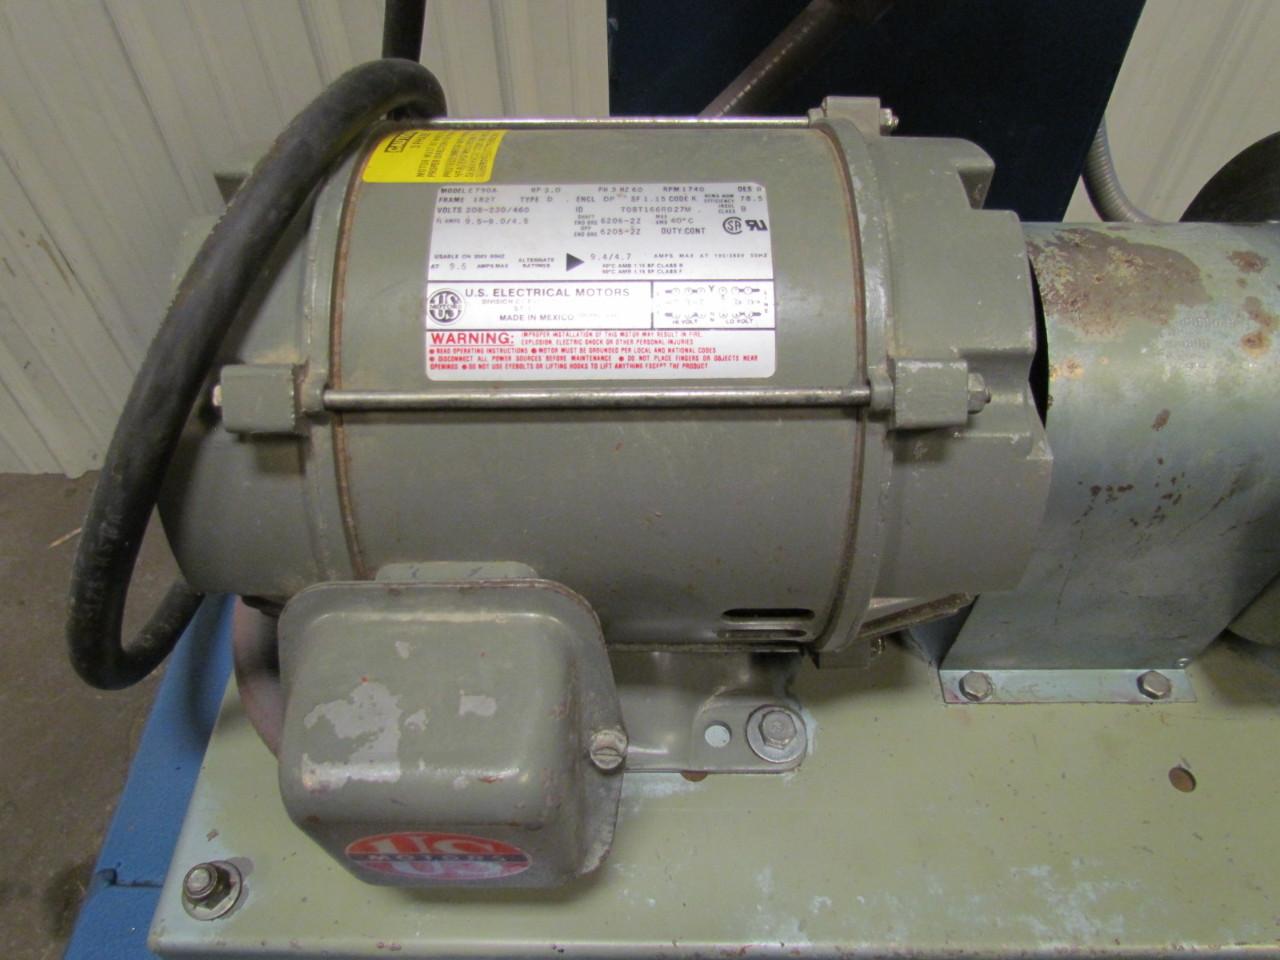 Vacuum Pump Gast Rotary Vane Pumps Wiring Diagram Photos Of